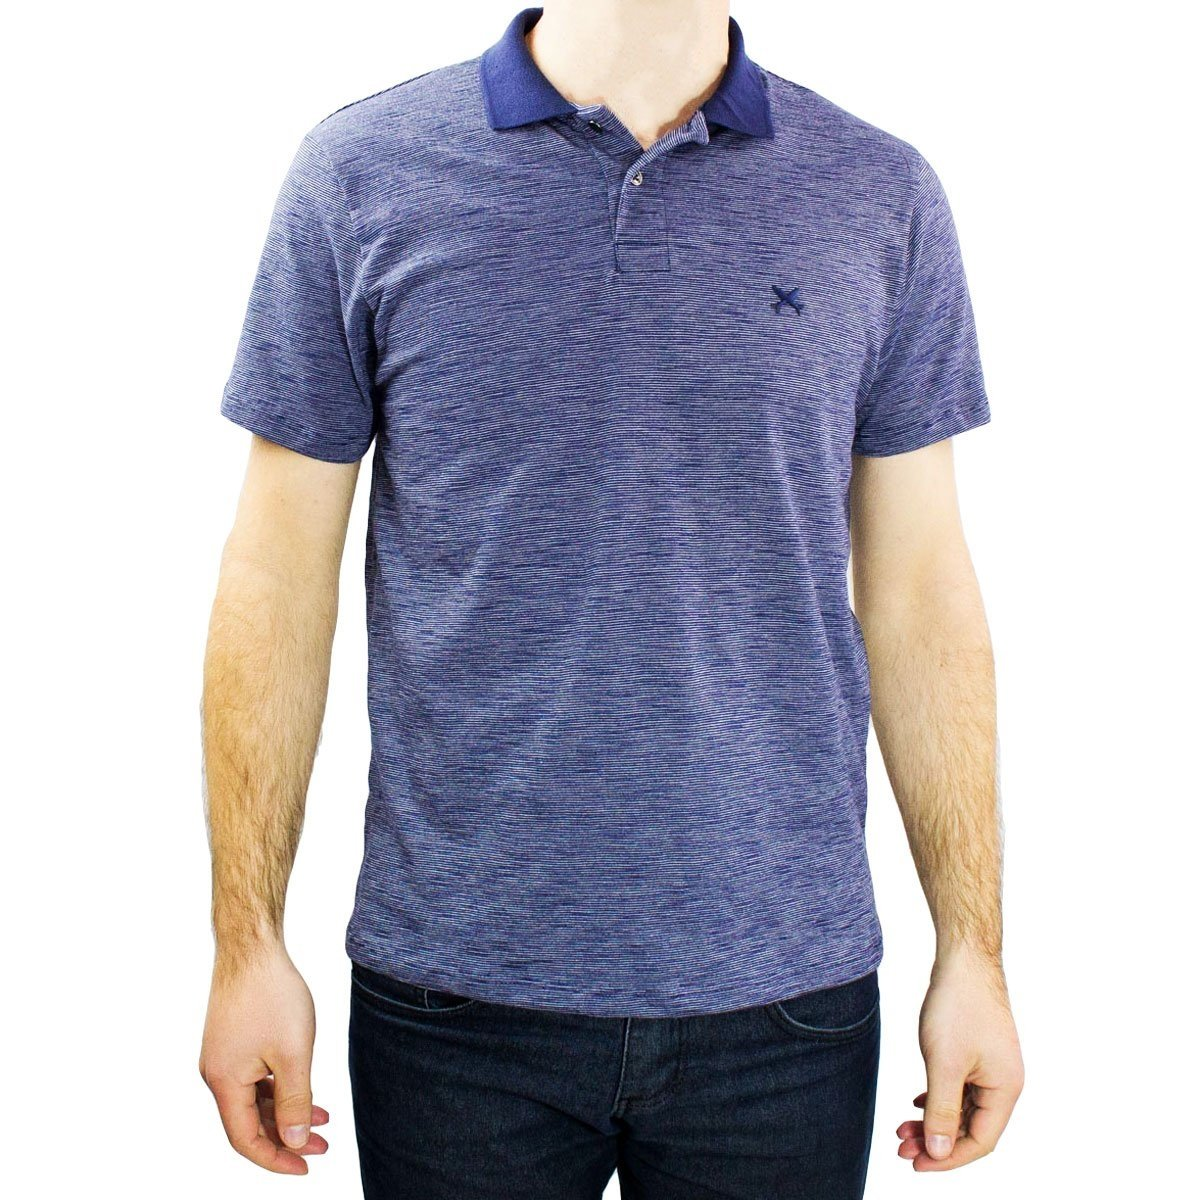 Camisa Polo Masculina Hering Tal Pai Tal Filho 53ahamsen - Compre Agora  7f18bdd17a8